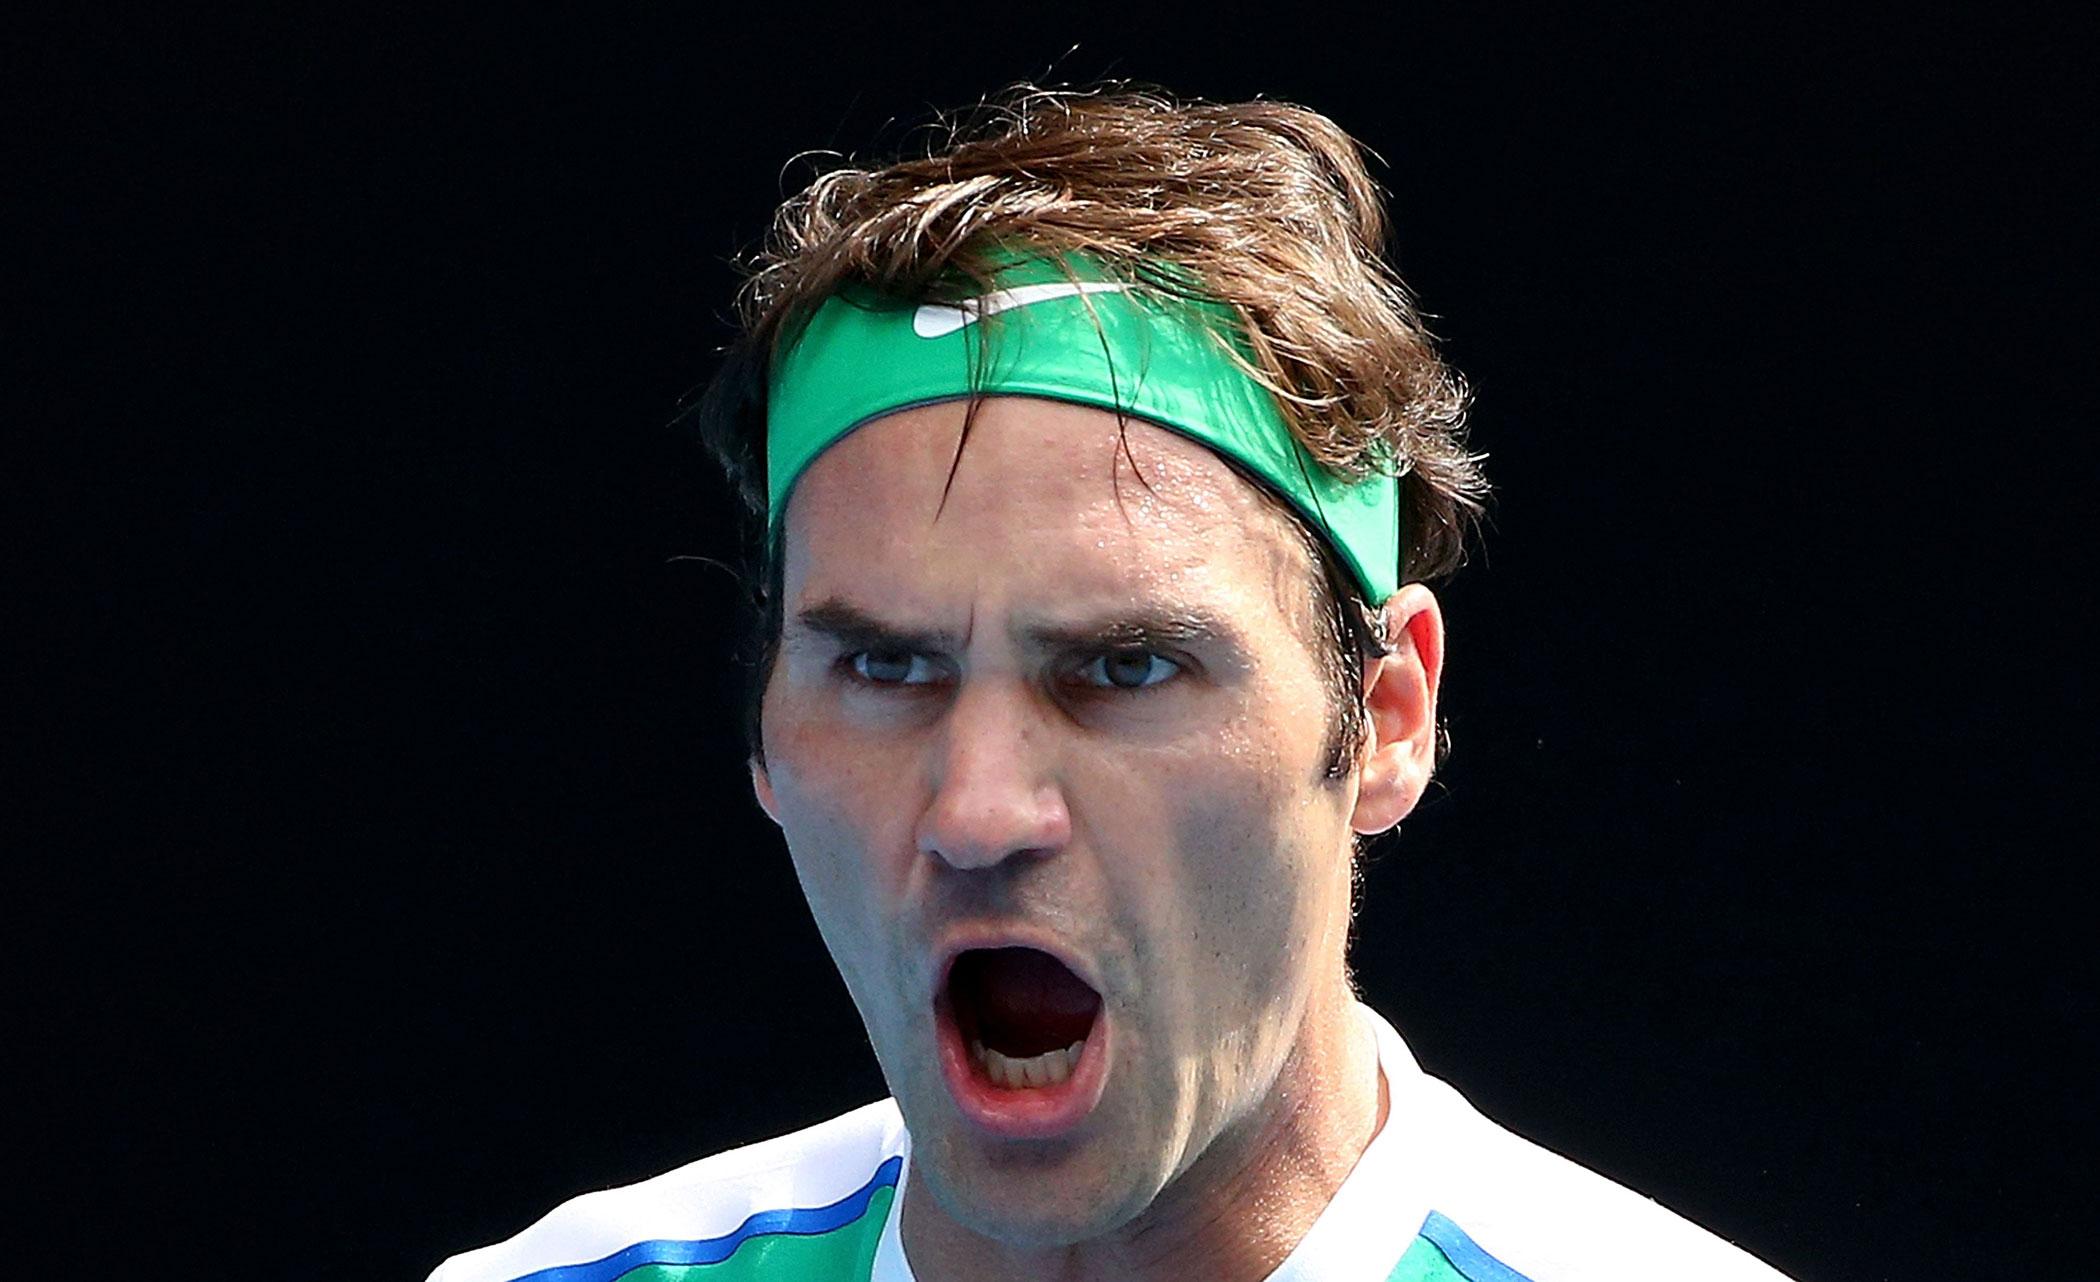 Switzerland's Roger Federer celebrates during his quarter final match against Czech Republic's Tomas Berdych on Jan. 26.